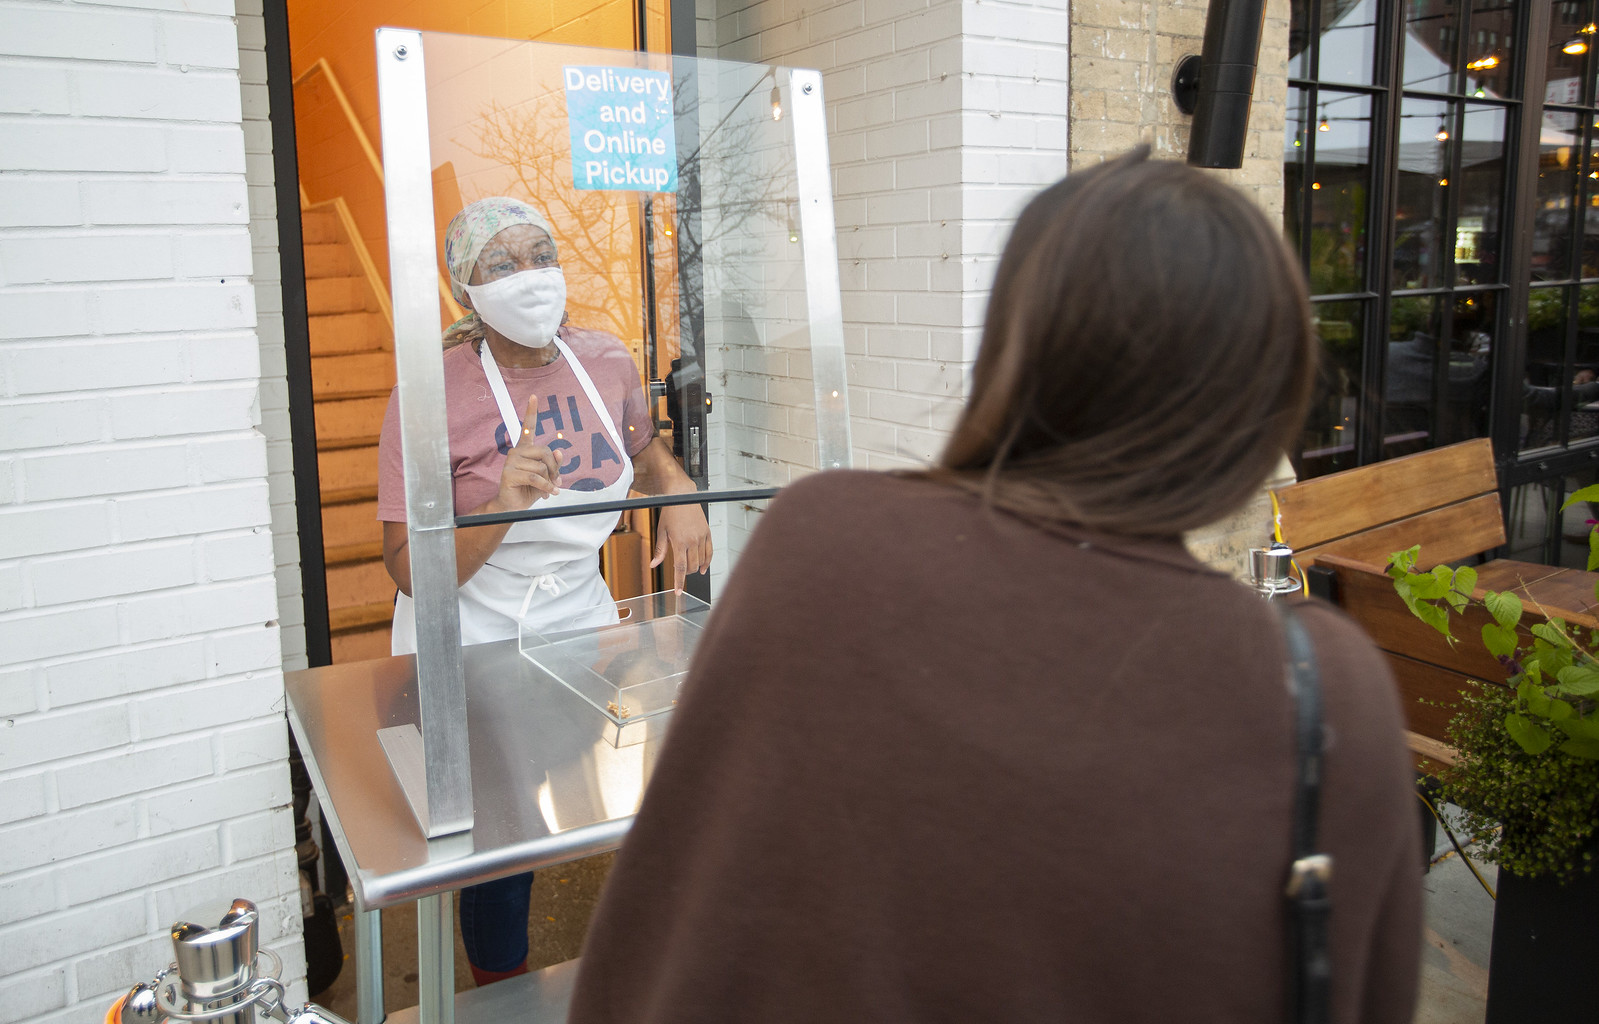 A restaurant worker wearing a mask taking an order through plexiglas.